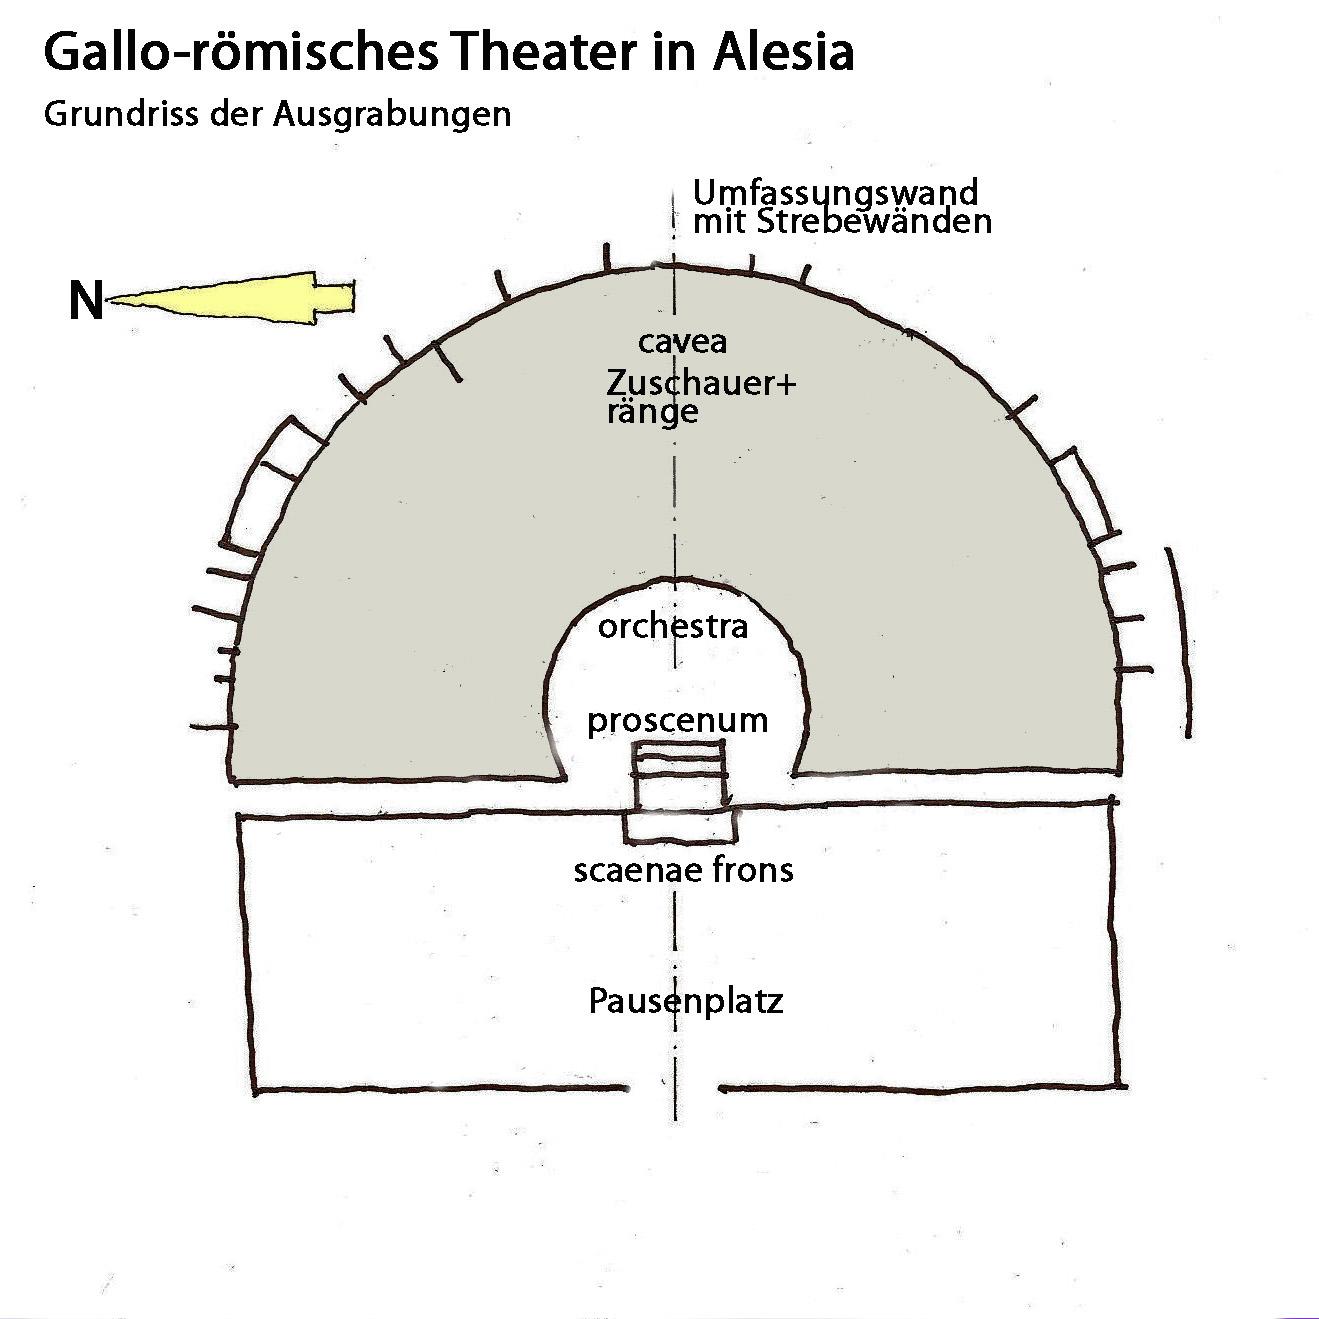 File:Galloröm. Theater in Alesia, Grundriss.JPG ...